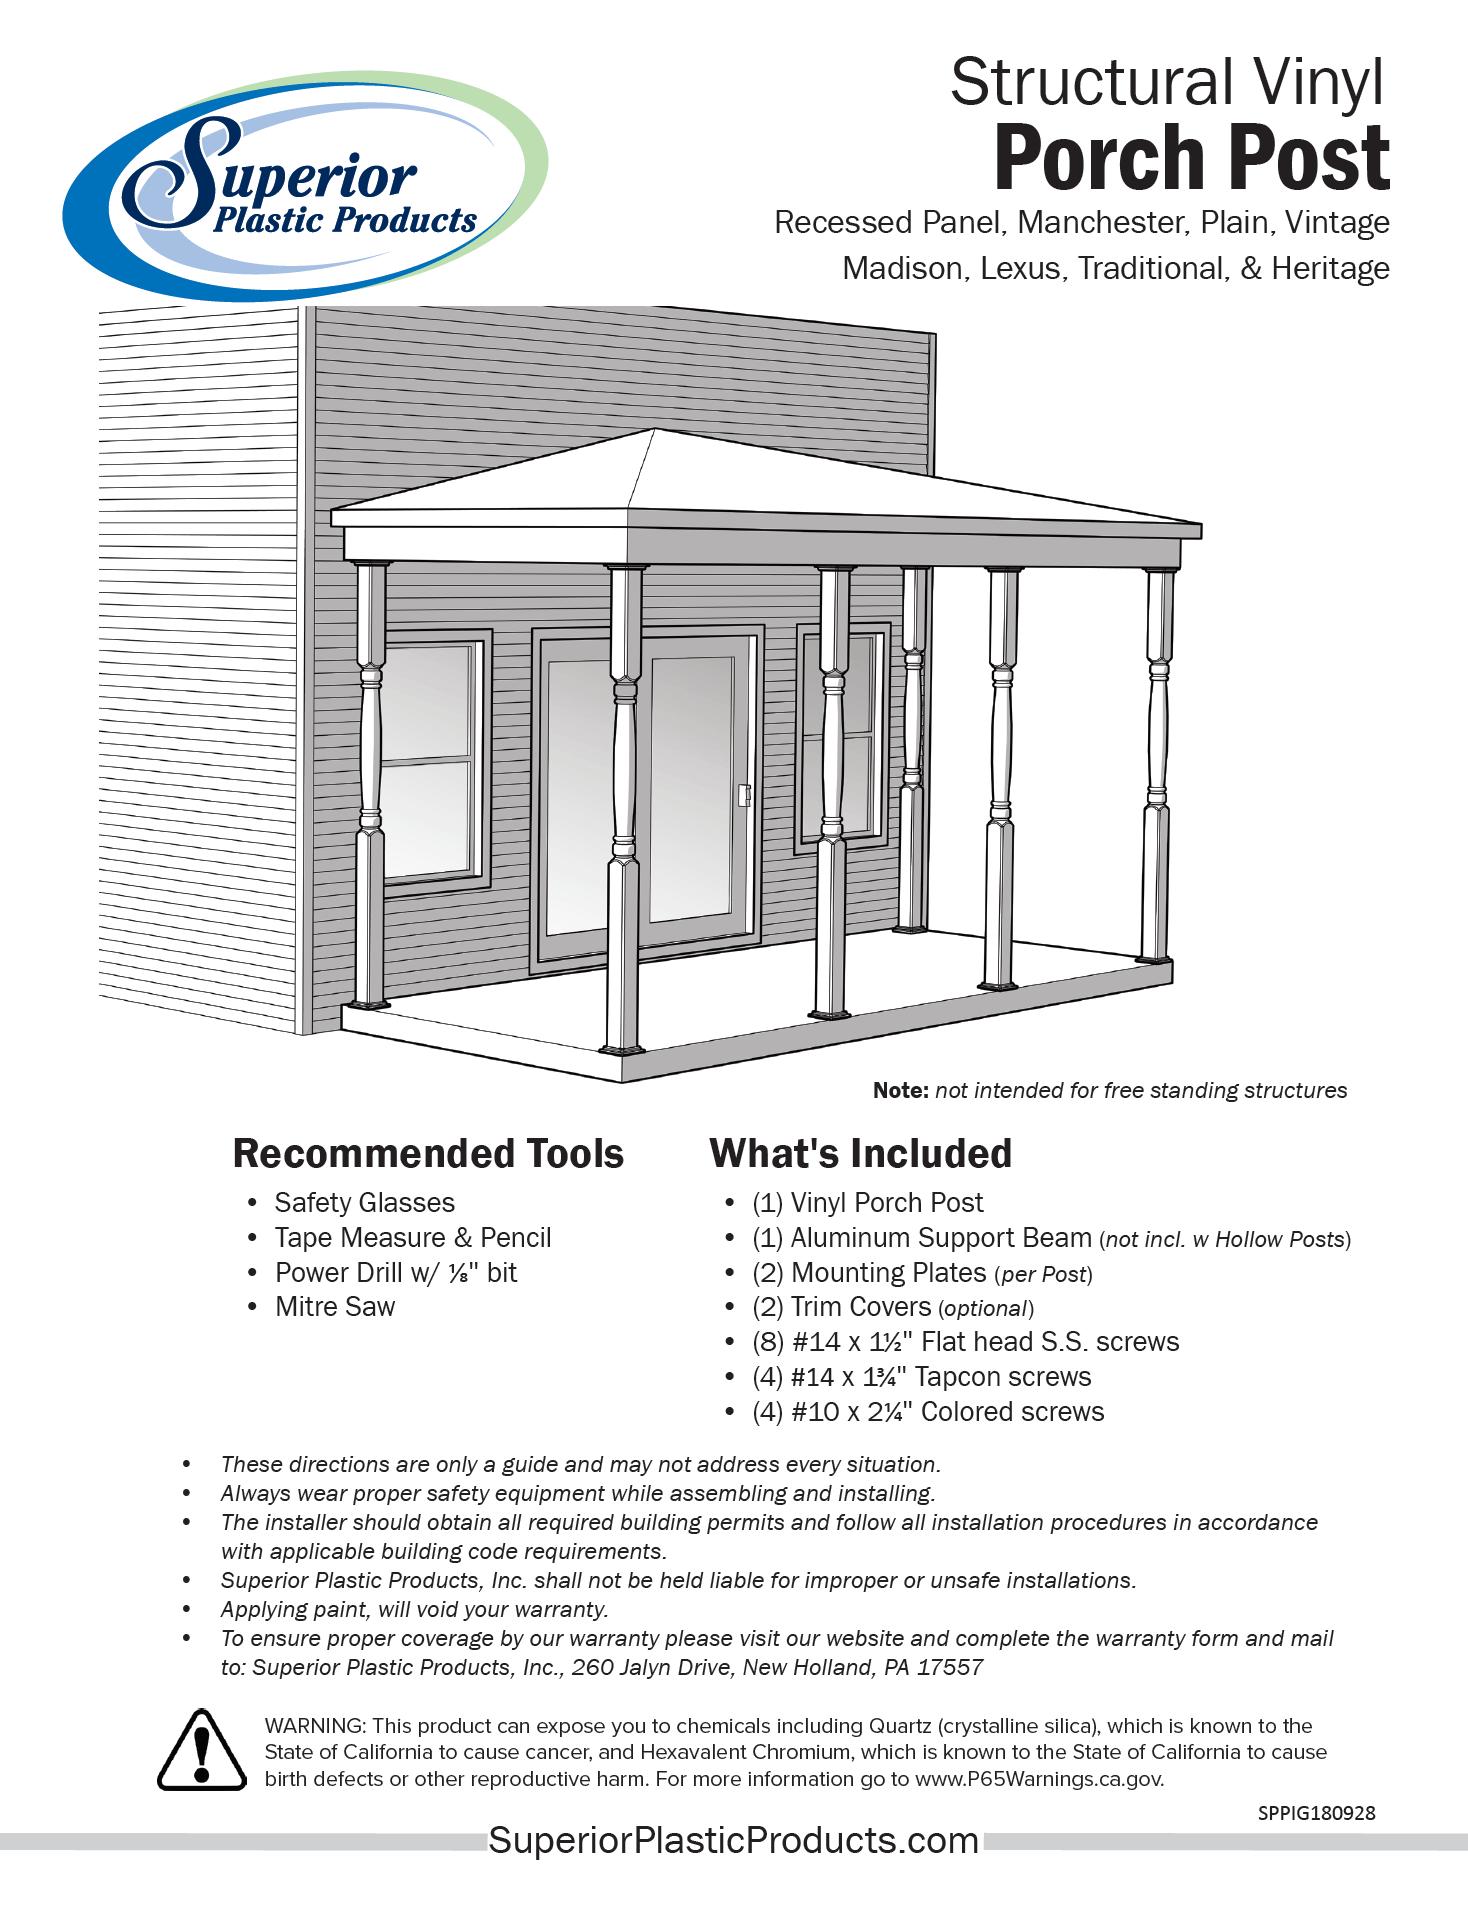 Structural Vinyl Porch Posts - Superior Plastic Products